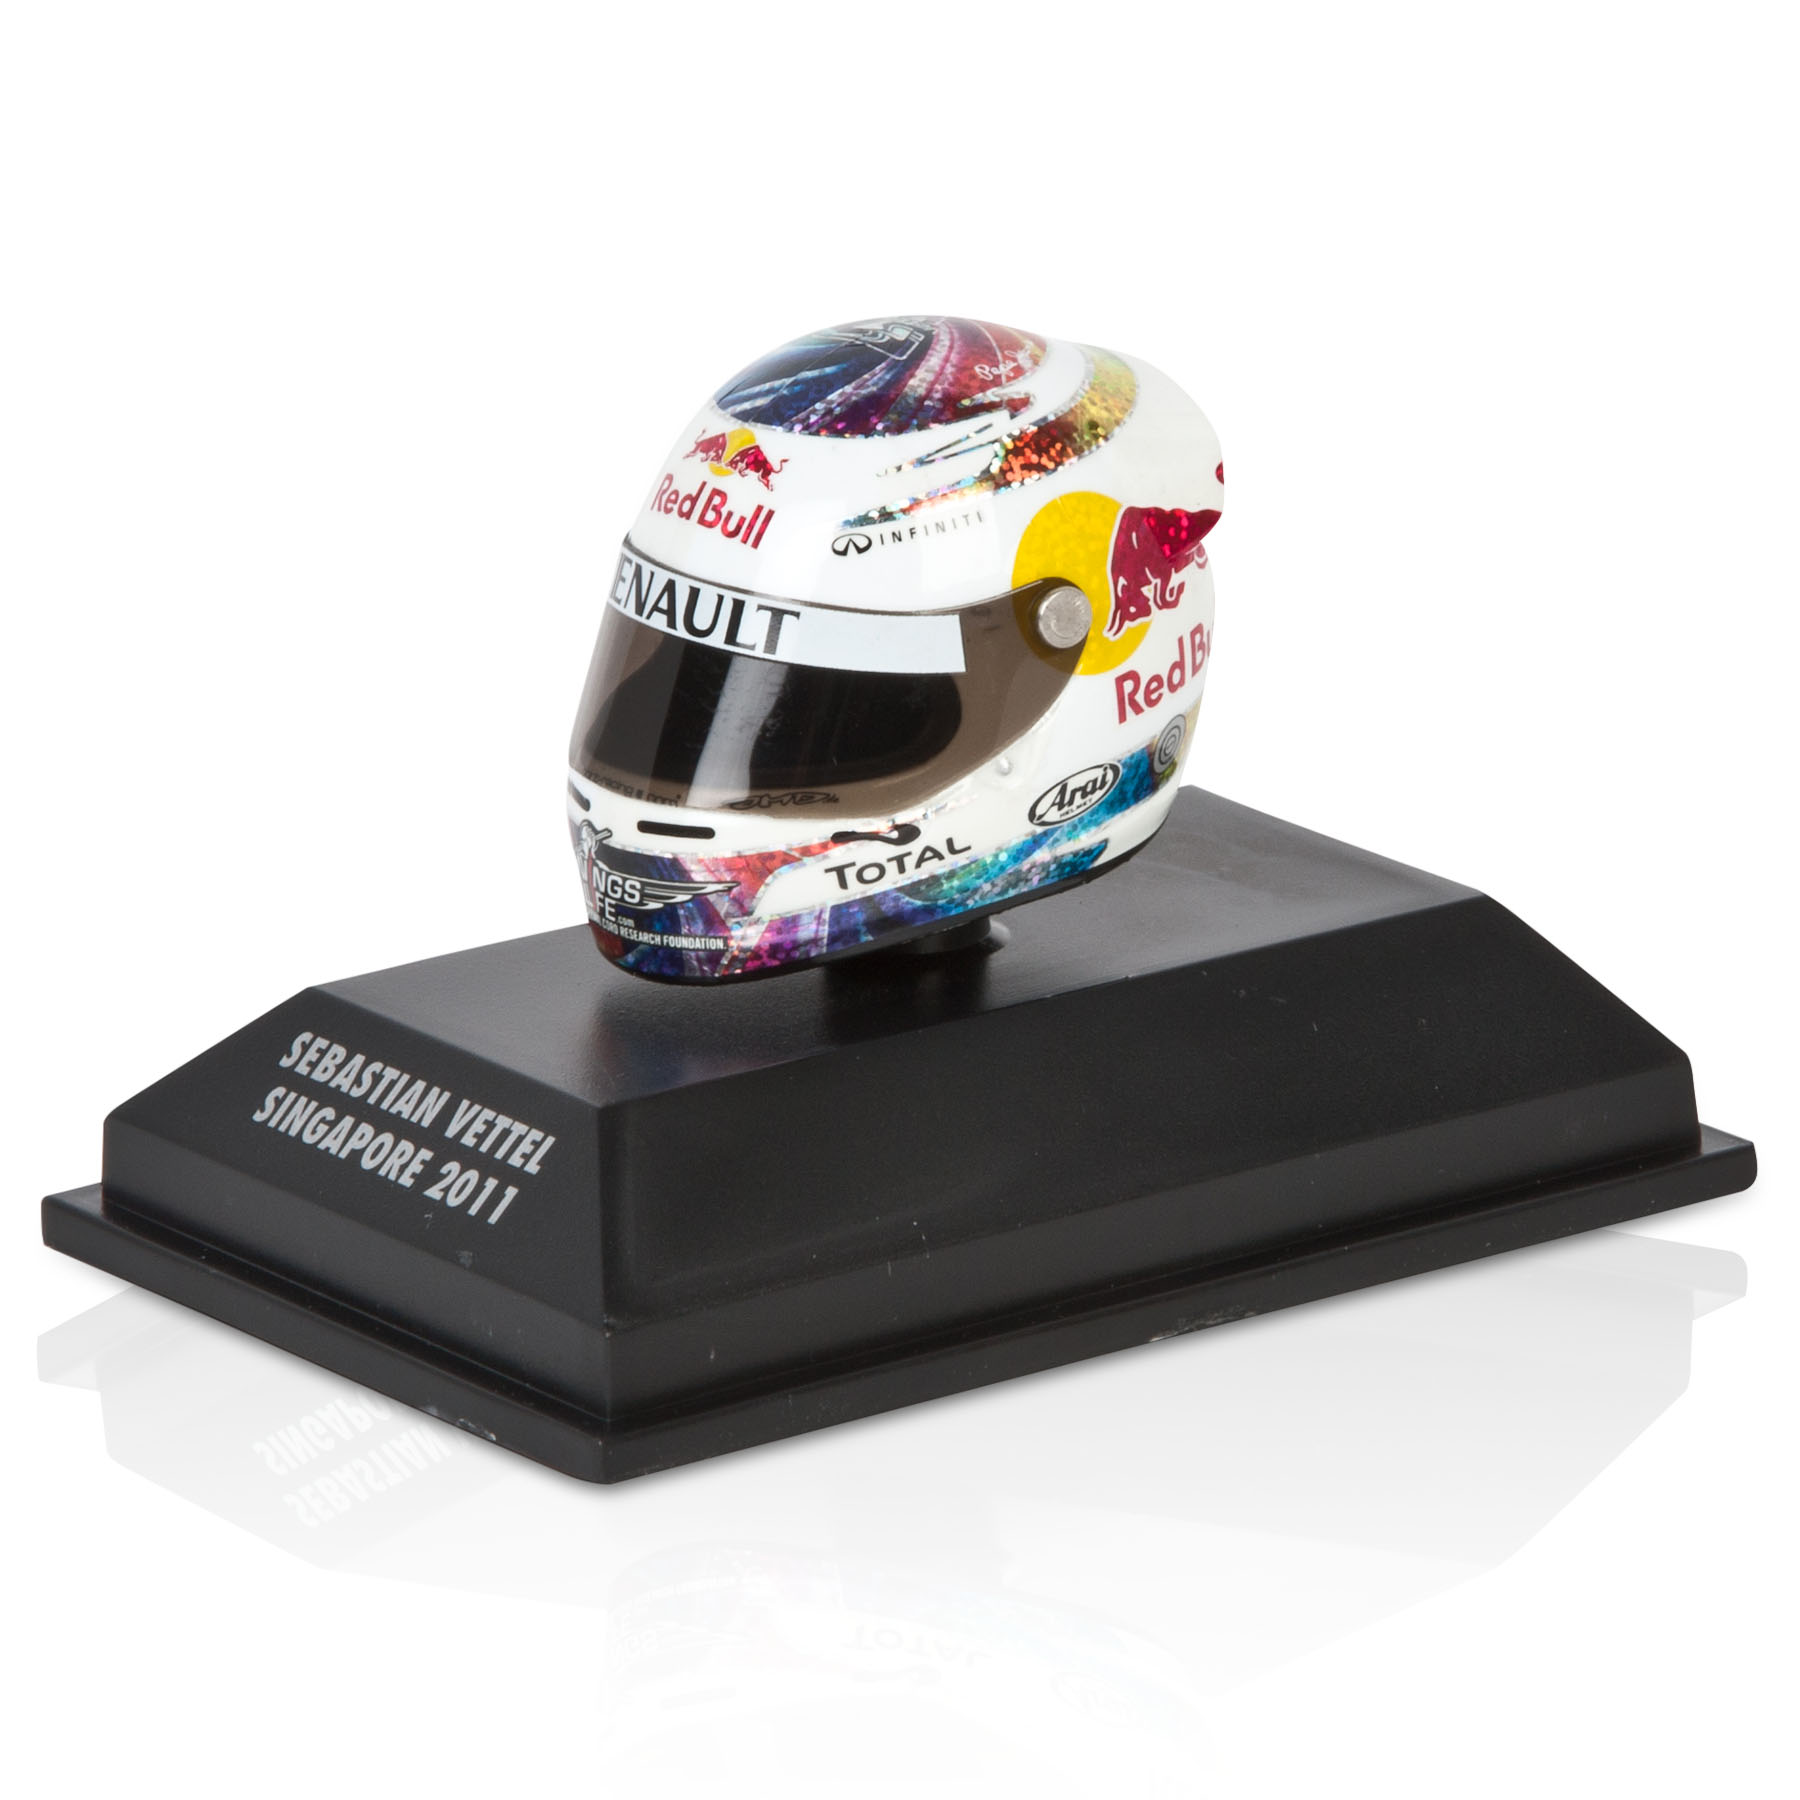 Die Cast Sebastian Vettel - Singapore 2011 1:8 Scale Arari Helmet Model Code: 381110201